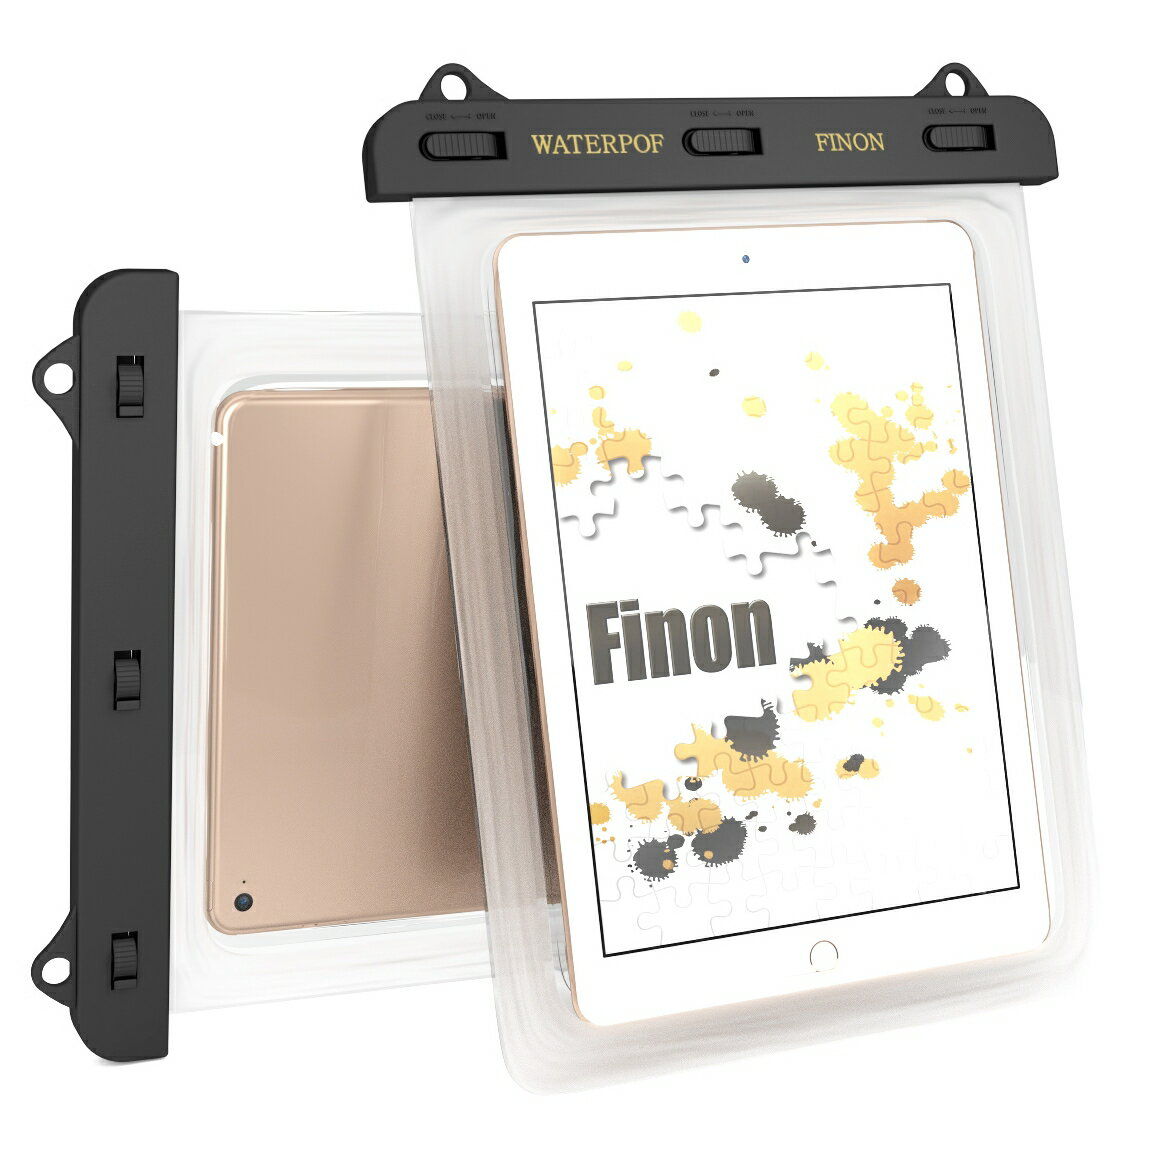 FINON【7-10インチ対応 WATERPOF CASE/防水ケース】防水ケース・専用ピック・ネックストラップ【iPad Pro9.7/Air/Air2/2/3/mini/2/3/4/Xperia Z4 Tablet/Z3 Tablet Compact/Amazon Fire/ASUS Pad/Google Nexus/AQUOS PAD/Huawei MediaPad/Docomo dtab 記載以外も対応】